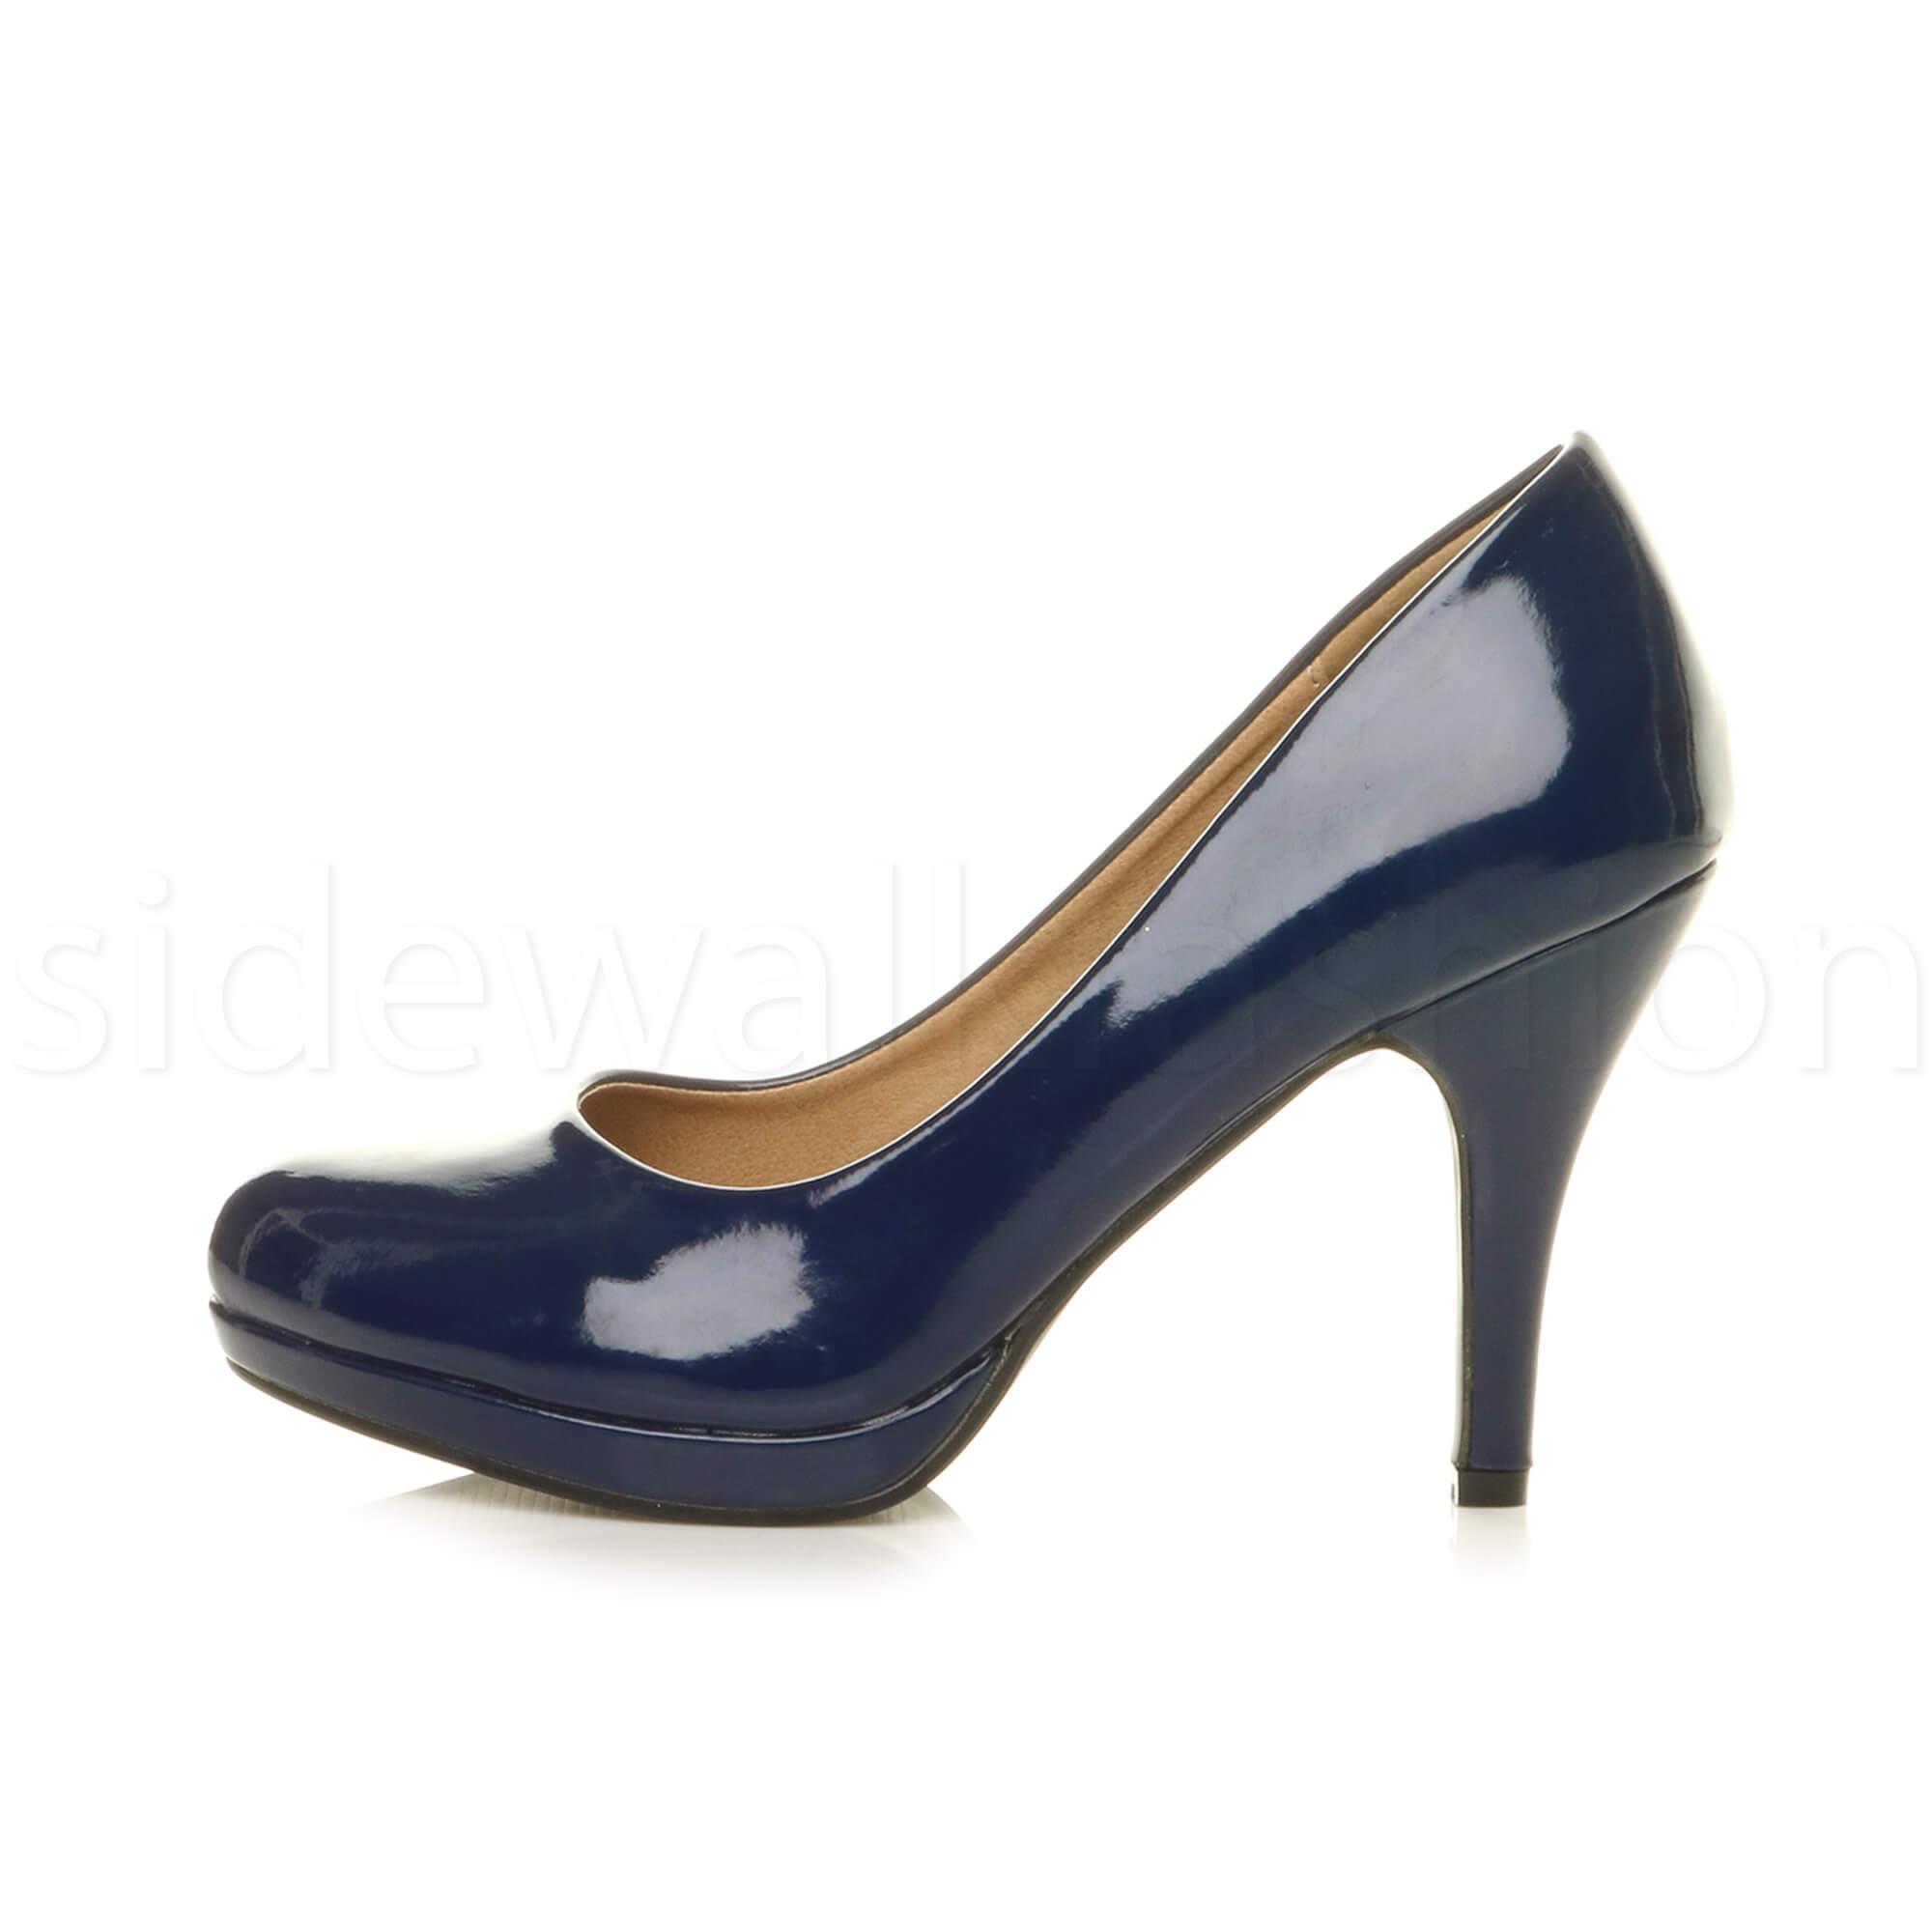 Navy Psrty Shoes Mid Heel